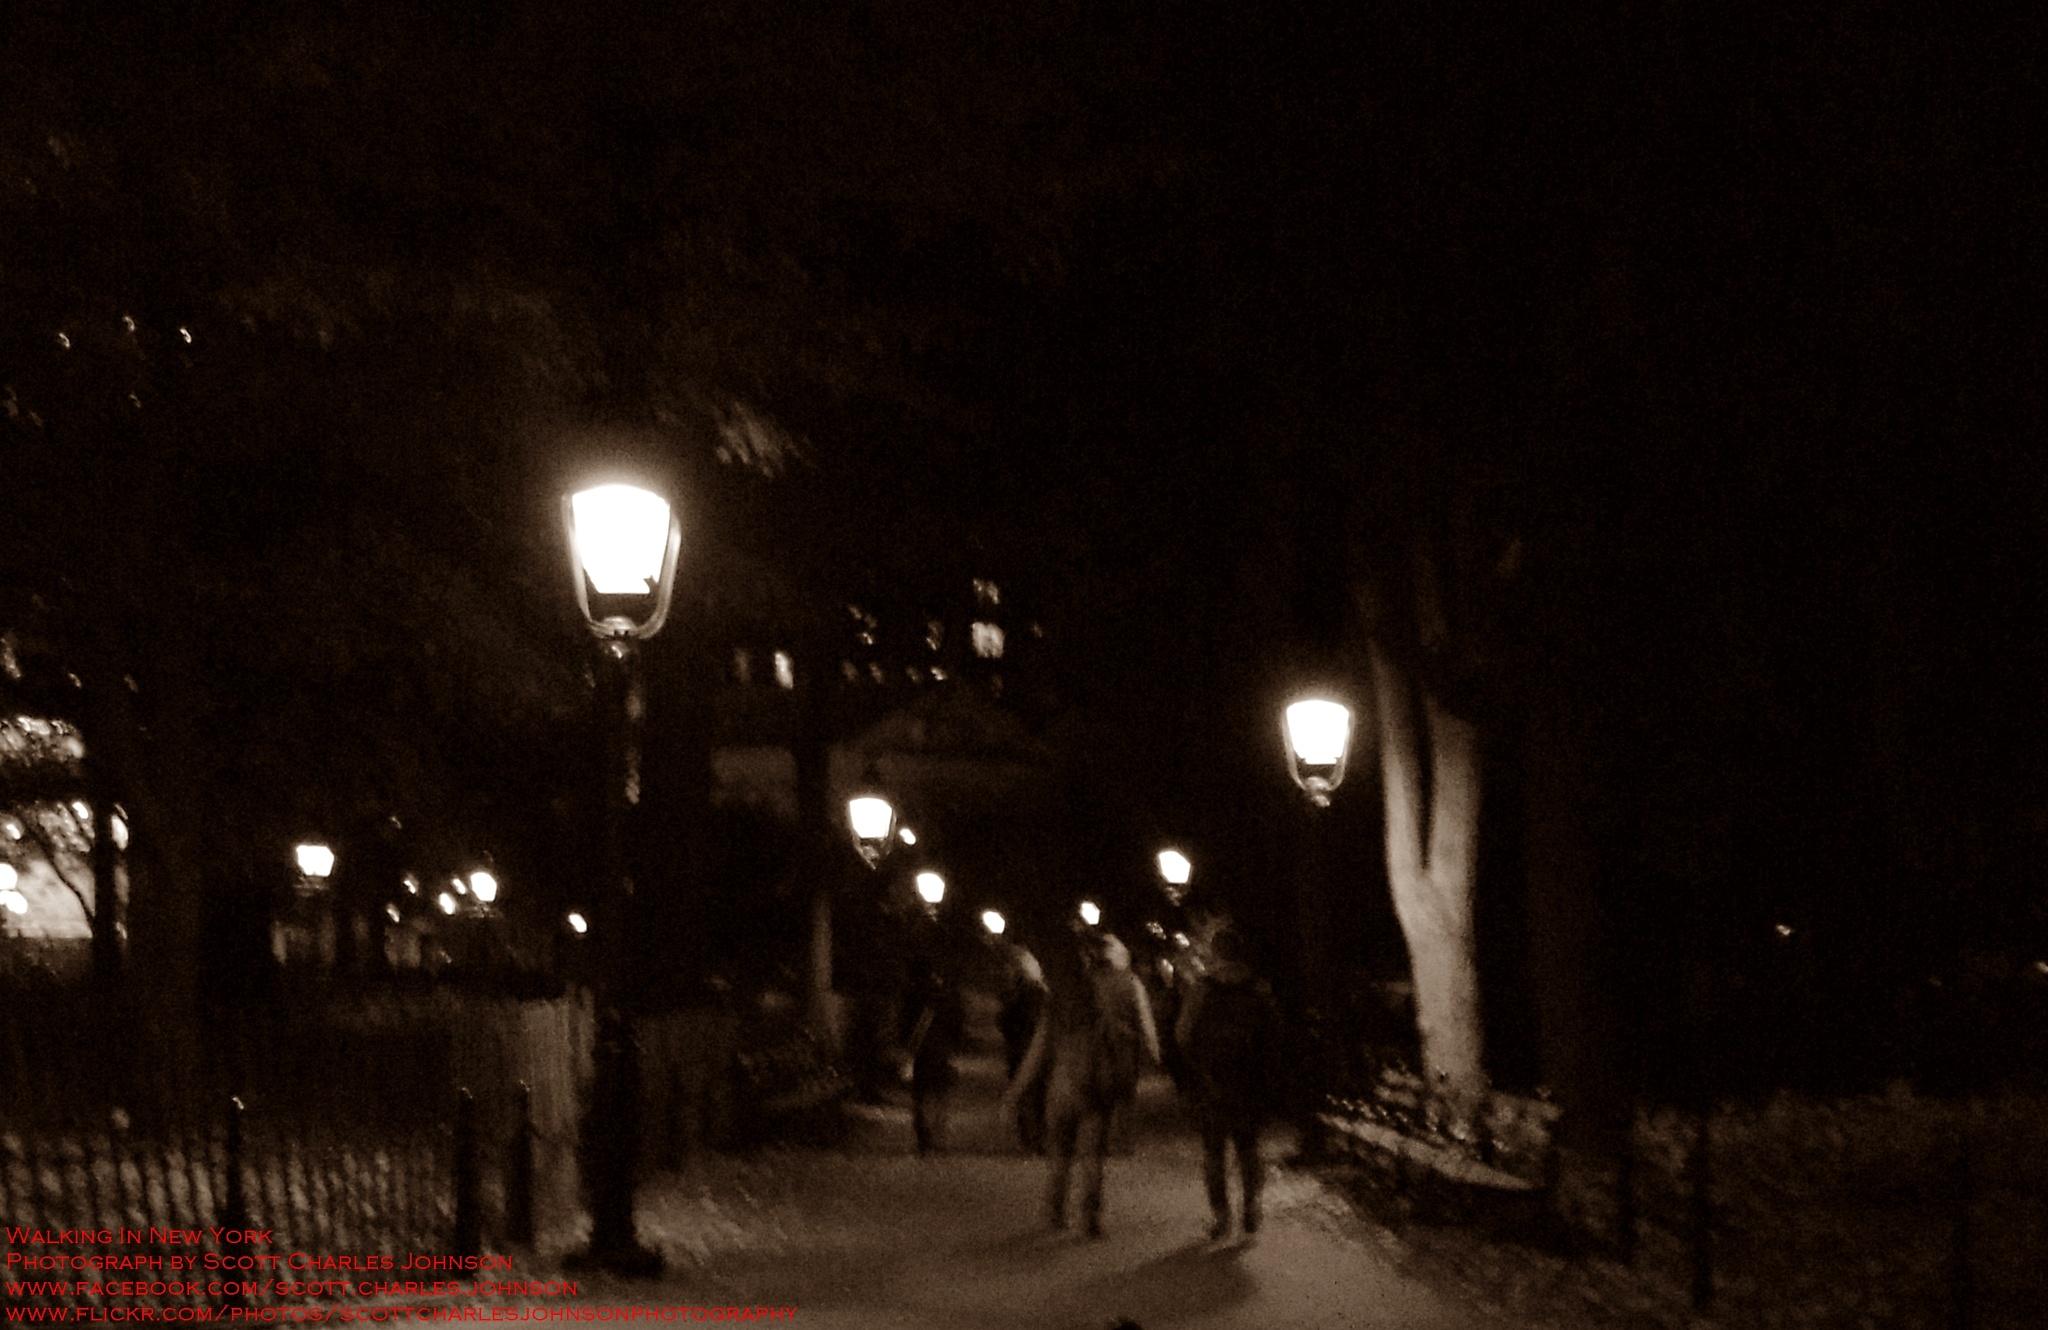 Walking In New York by Scott Charles Johnson